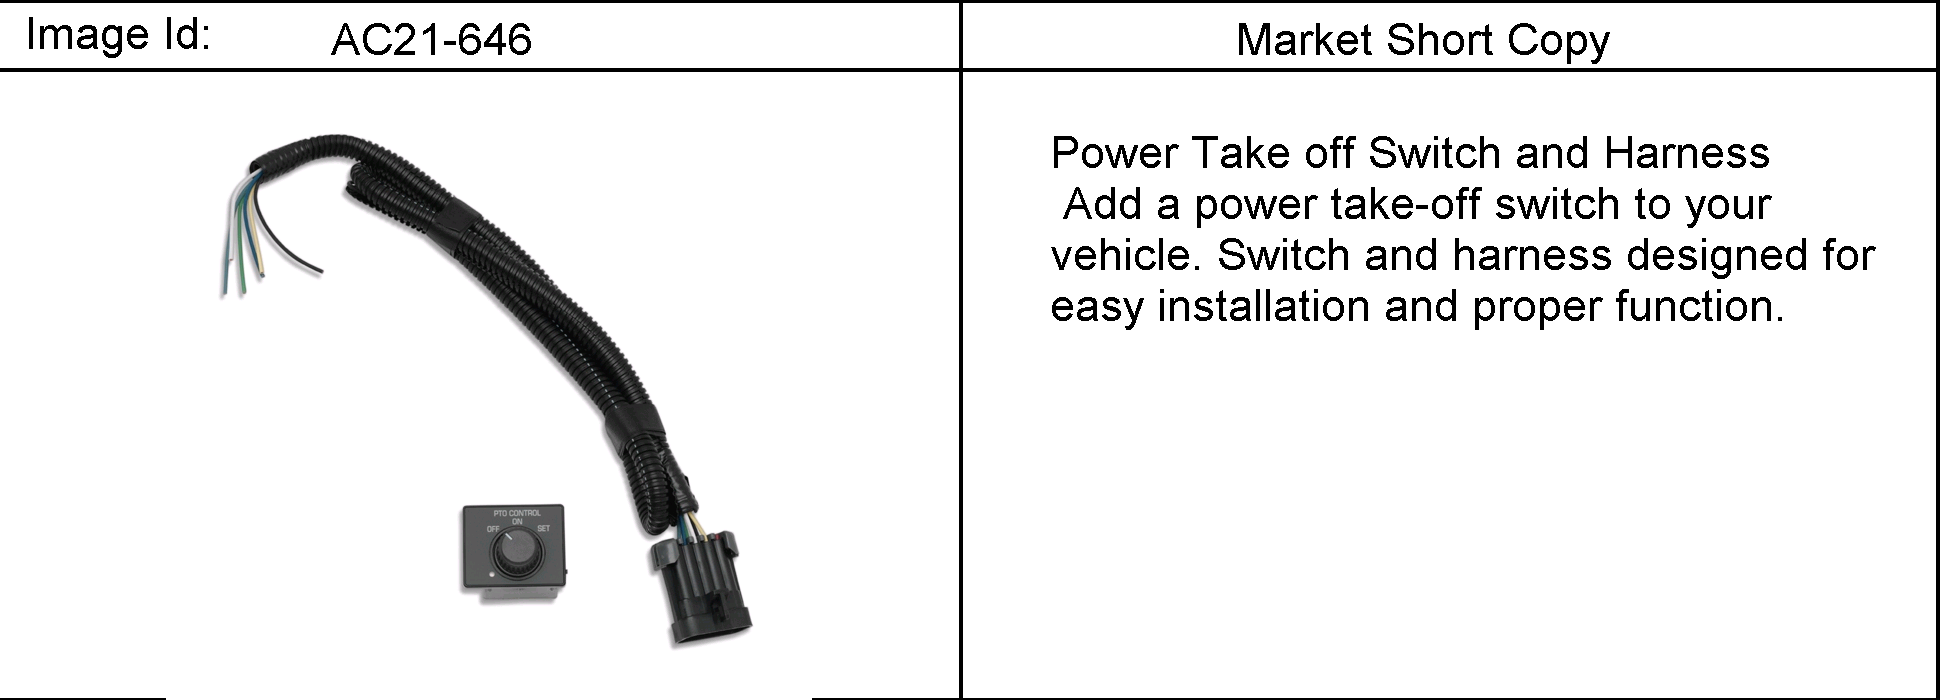 AVALANCHE 1500 4WD - Harness pkg/trailer wiring > Chevrolet EPC Online >  Nemiga.com